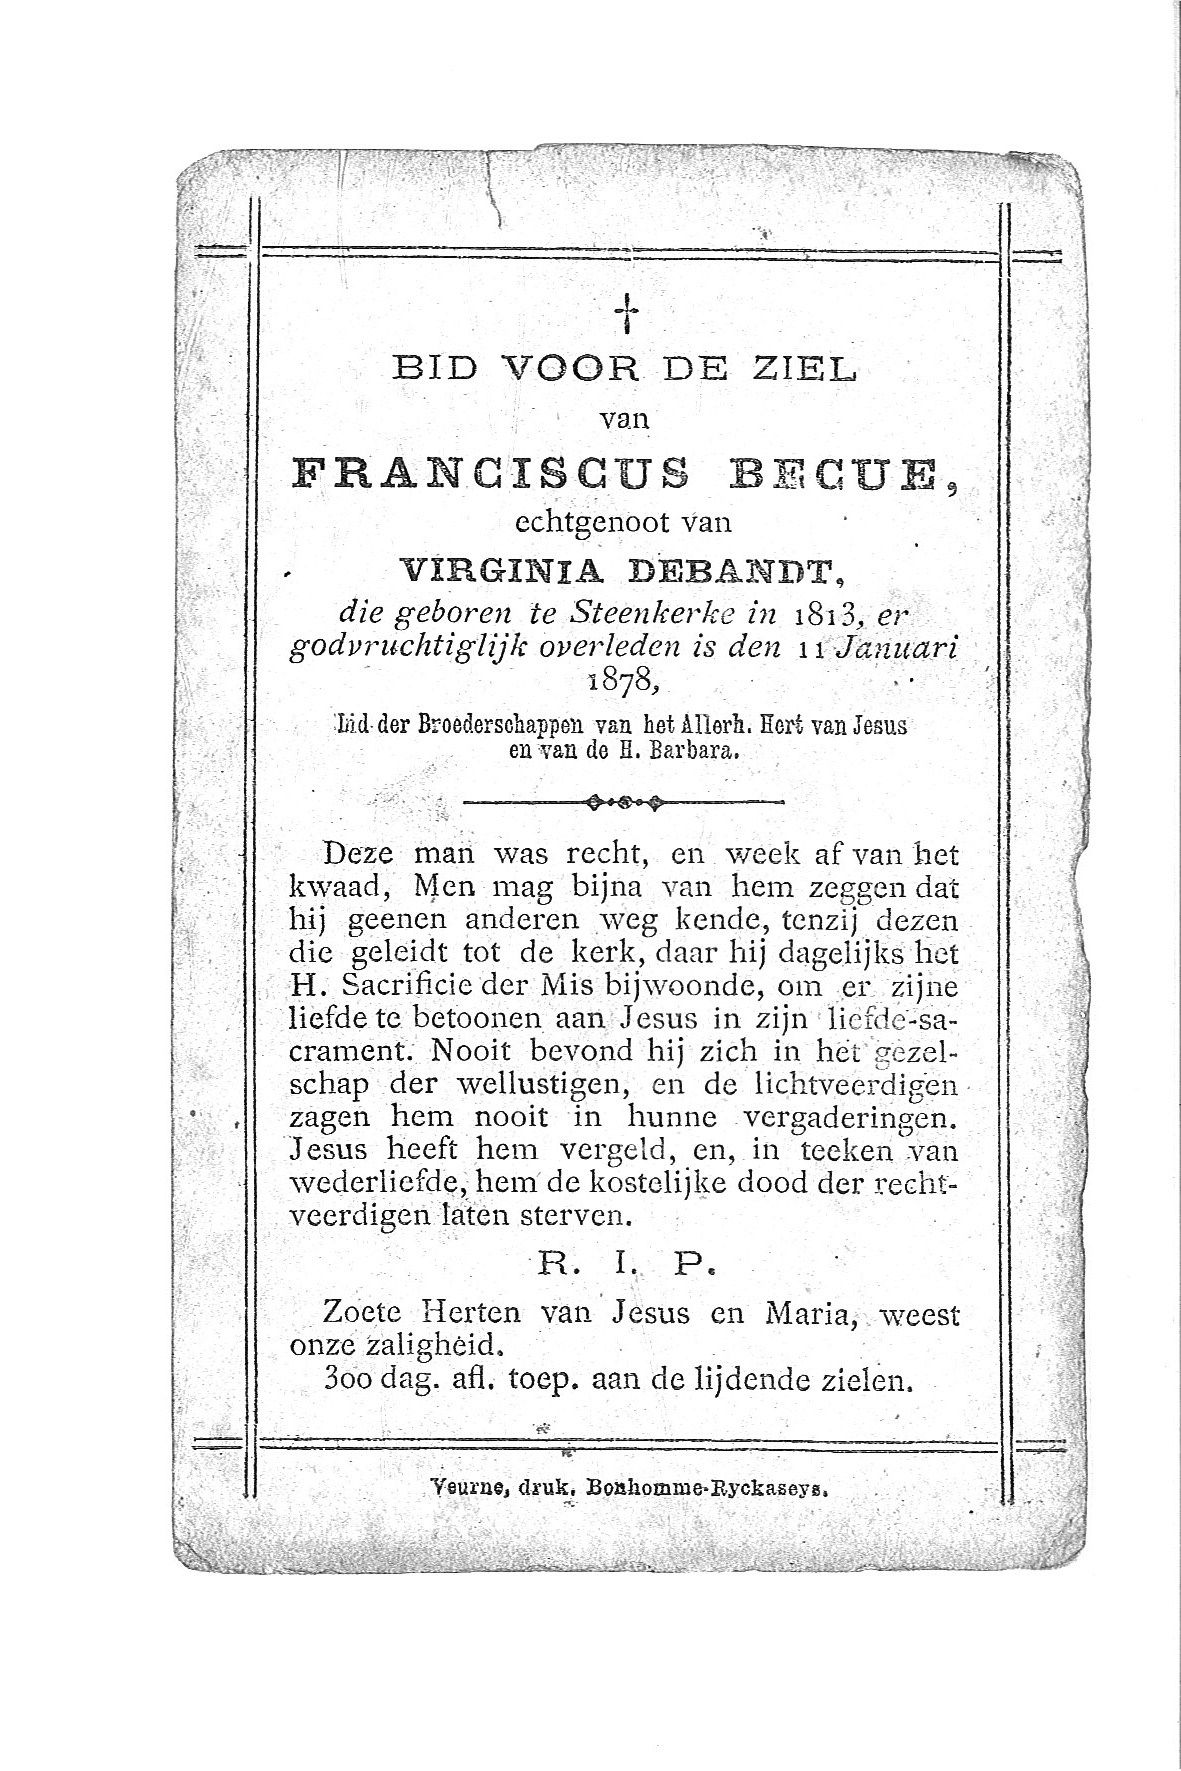 franciscus(1878)20090813090145_00031.jpg